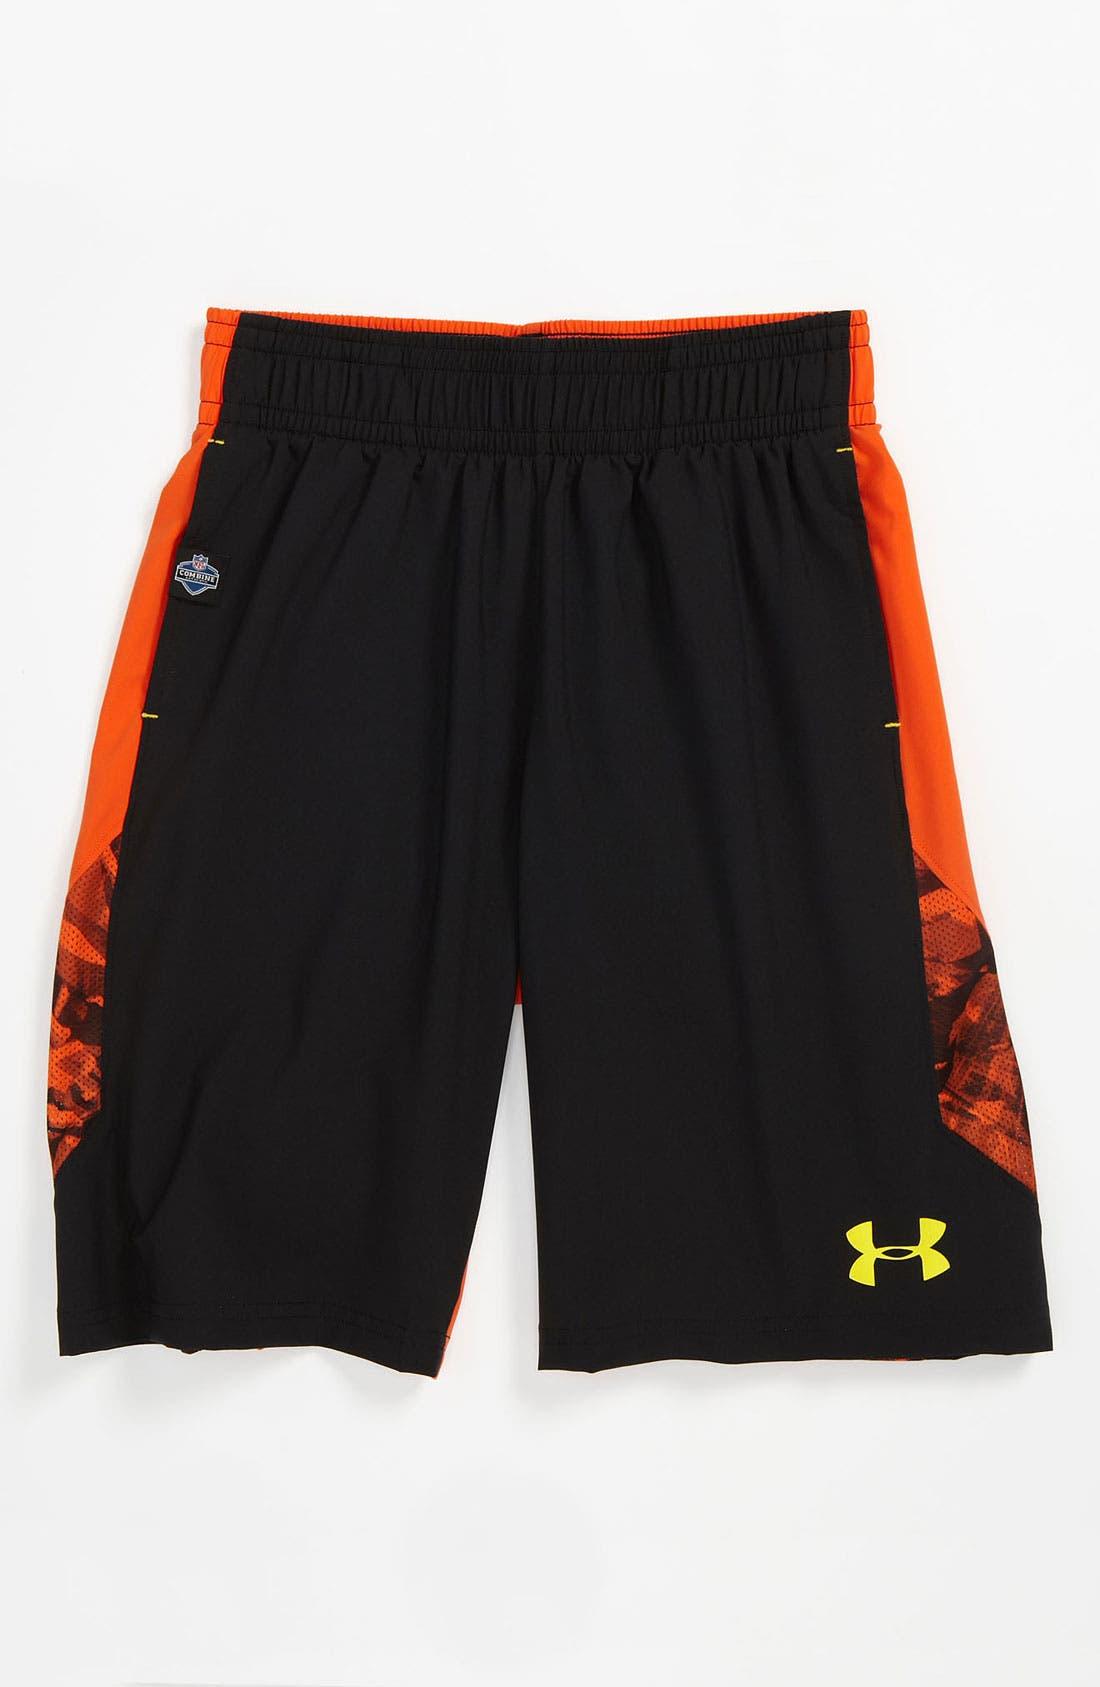 Alternate Image 1 Selected - Under Armour 'NFL Combine' Shorts (Big Boys)